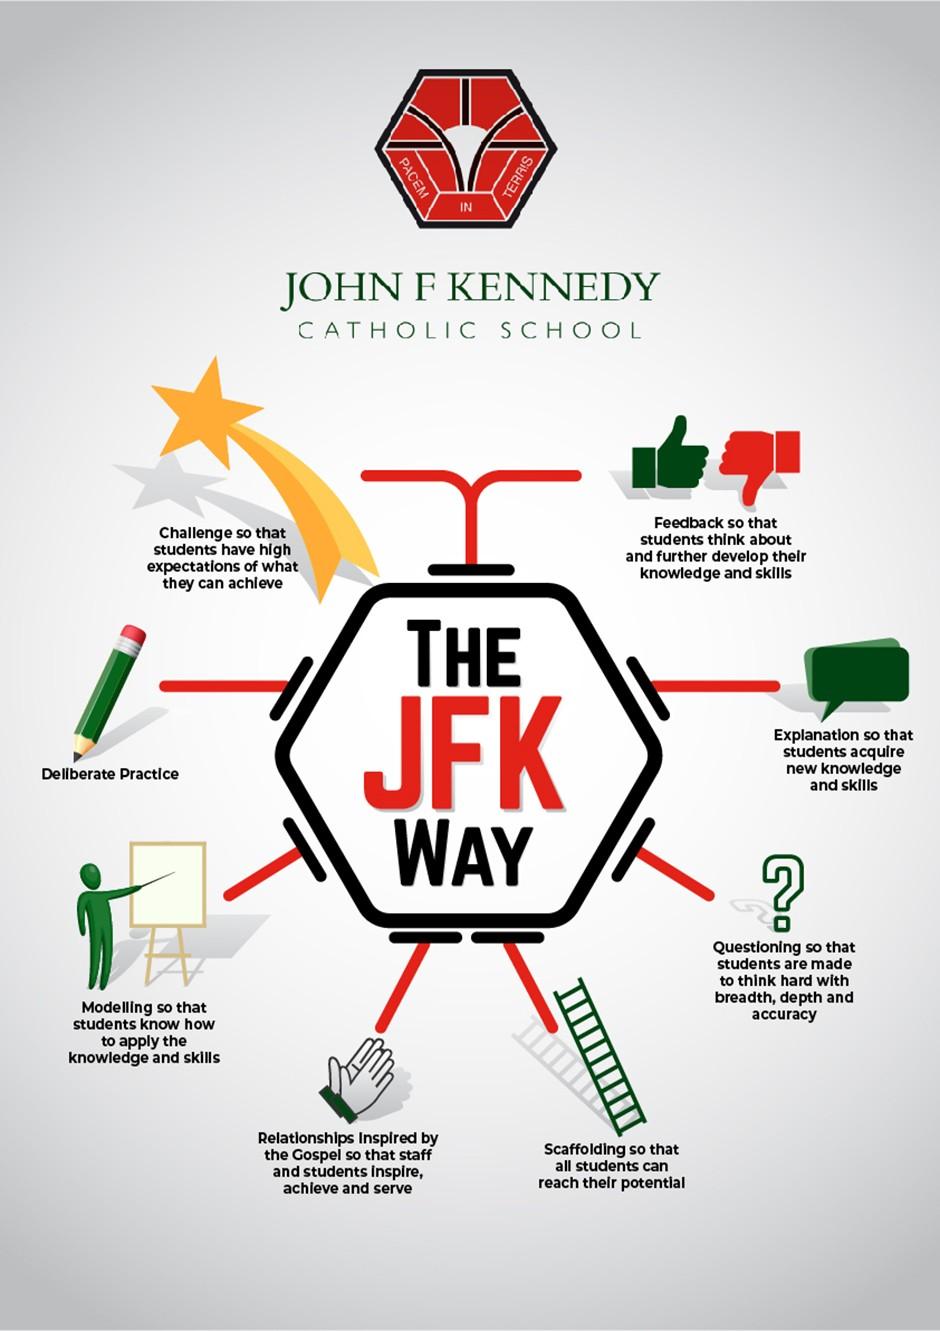 John F Kennedy Catholic School - Poster Design